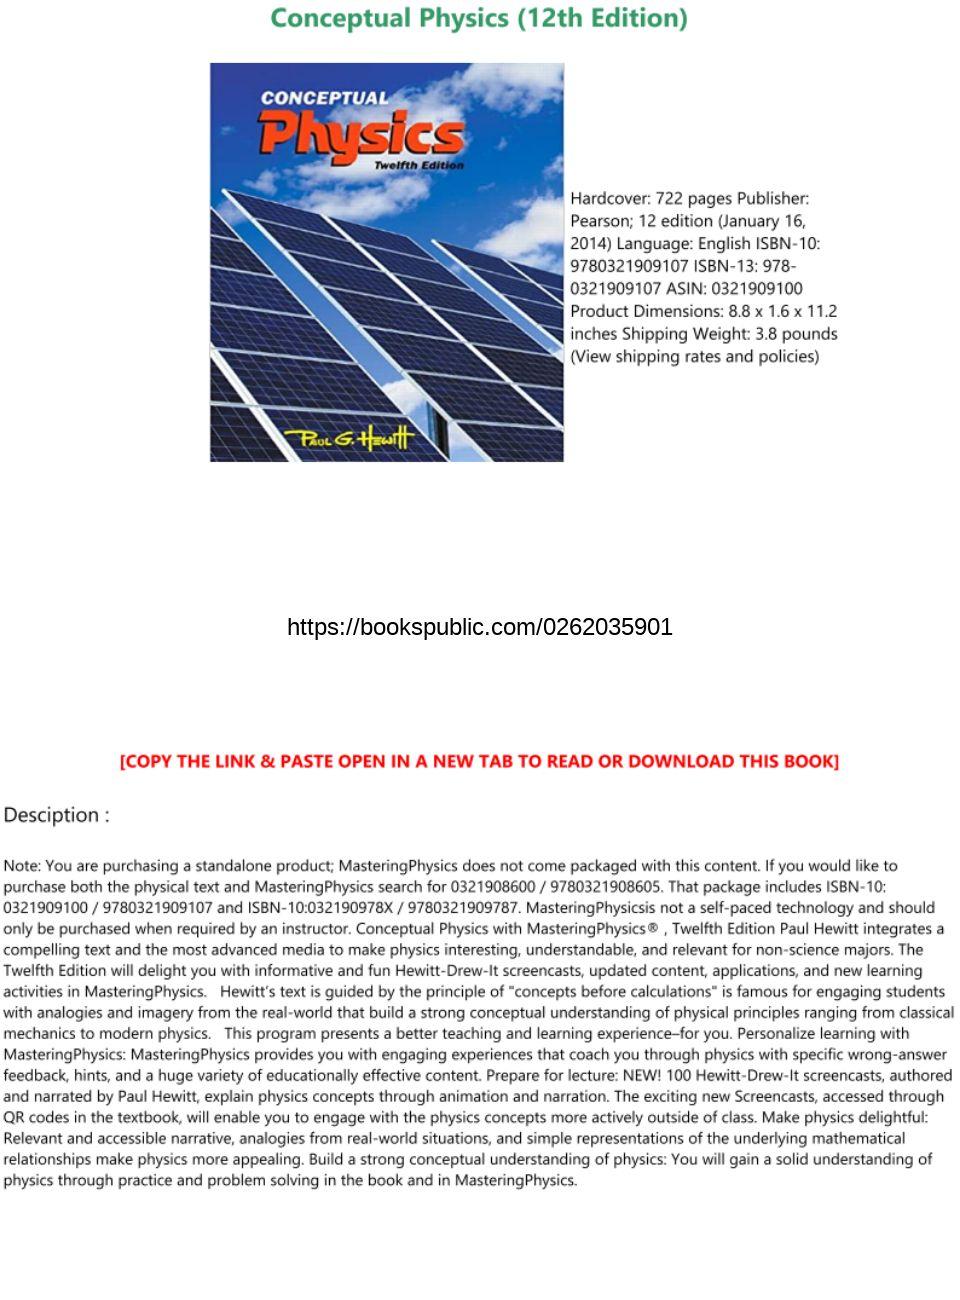 Conceptual Physics 12th Edition Pdf